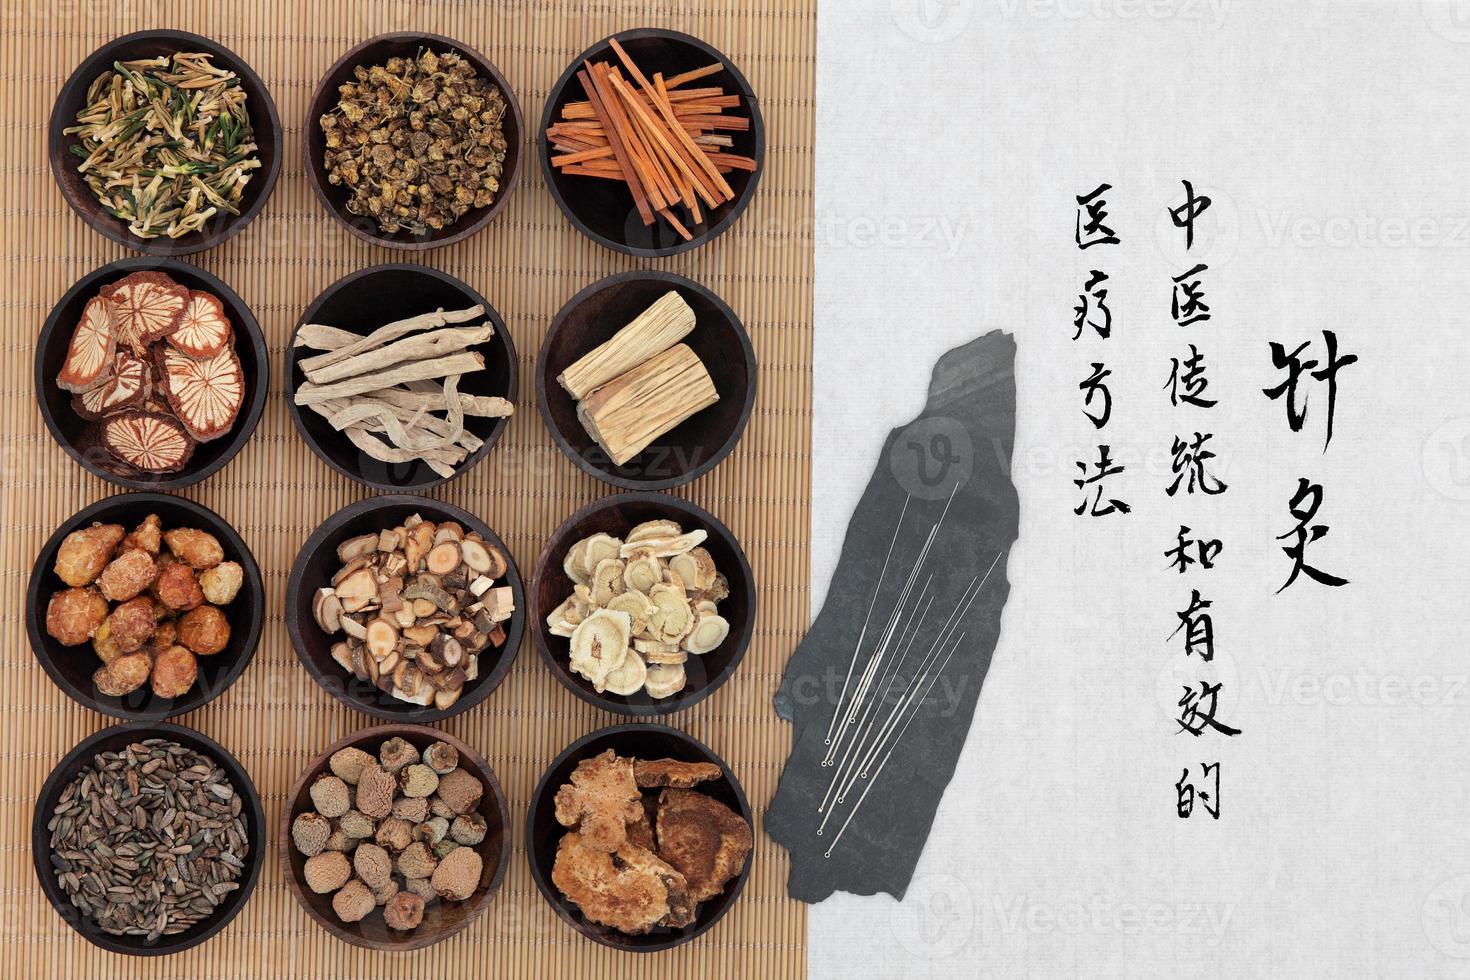 medicina tradicional china foto